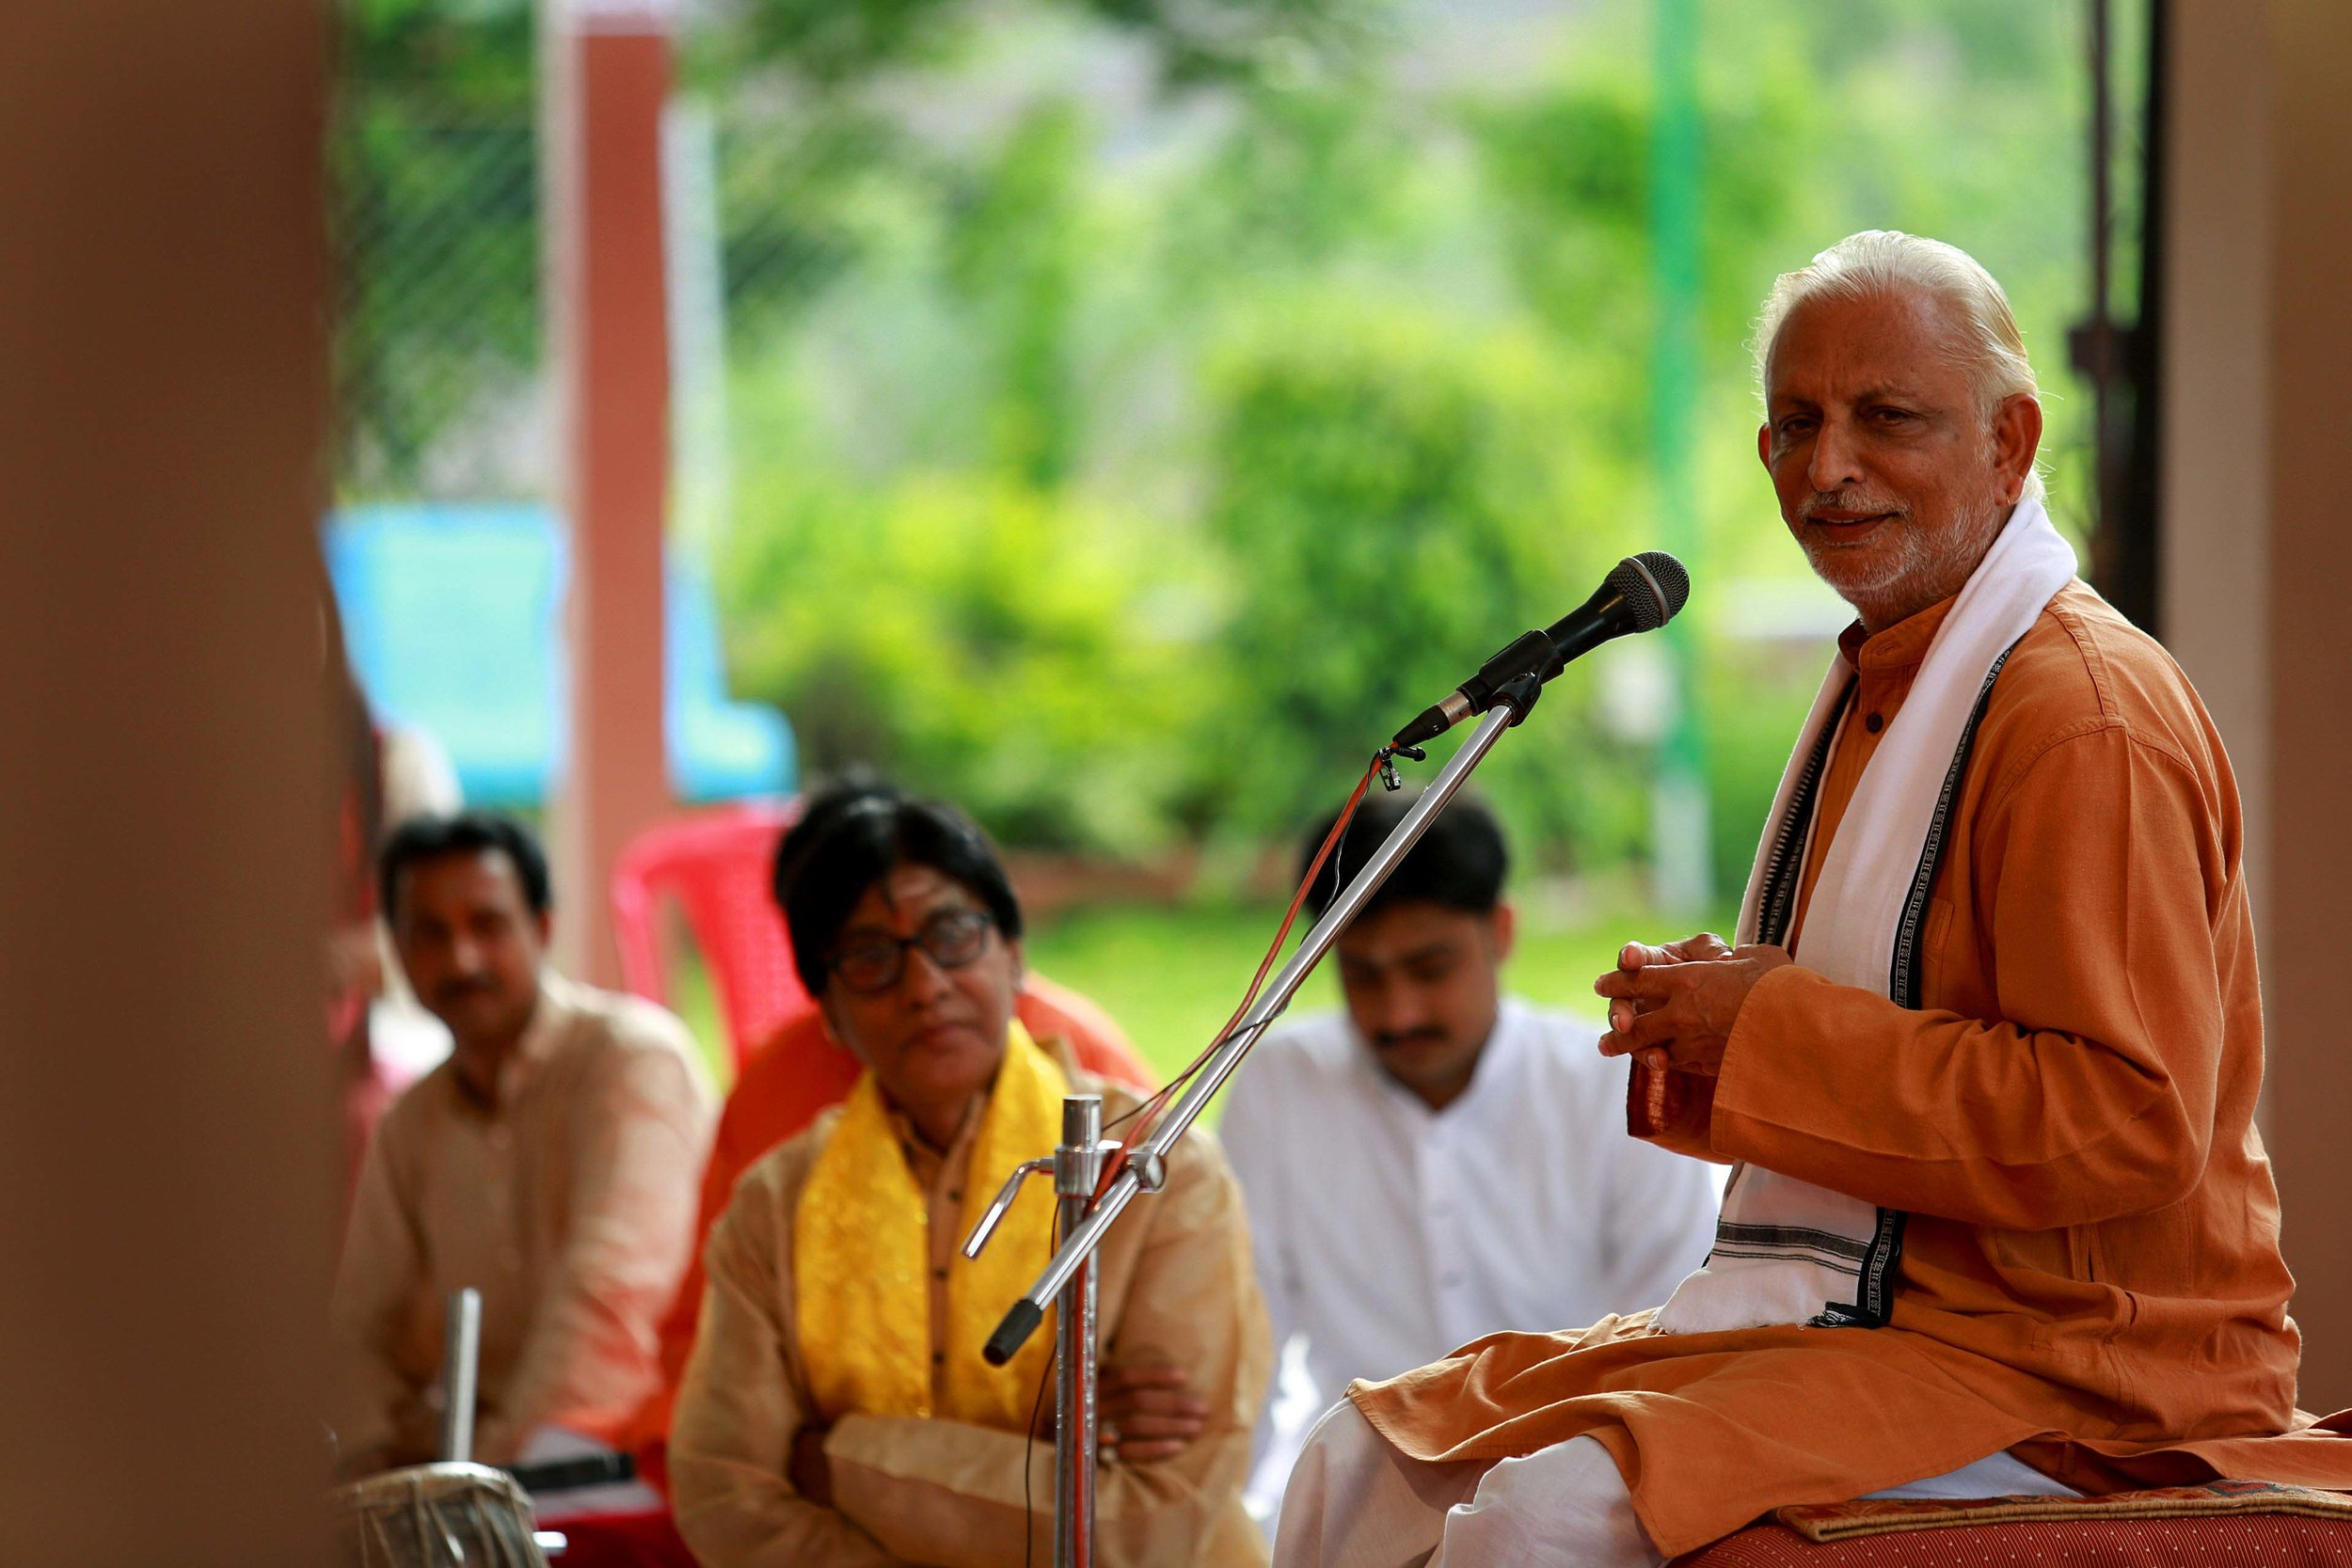 An-intimate-Satsang-on-Gurupoornima-Pandit-Kanta-Prasad-Mishra-looks-on-Nashik-Maharashtra.jpg